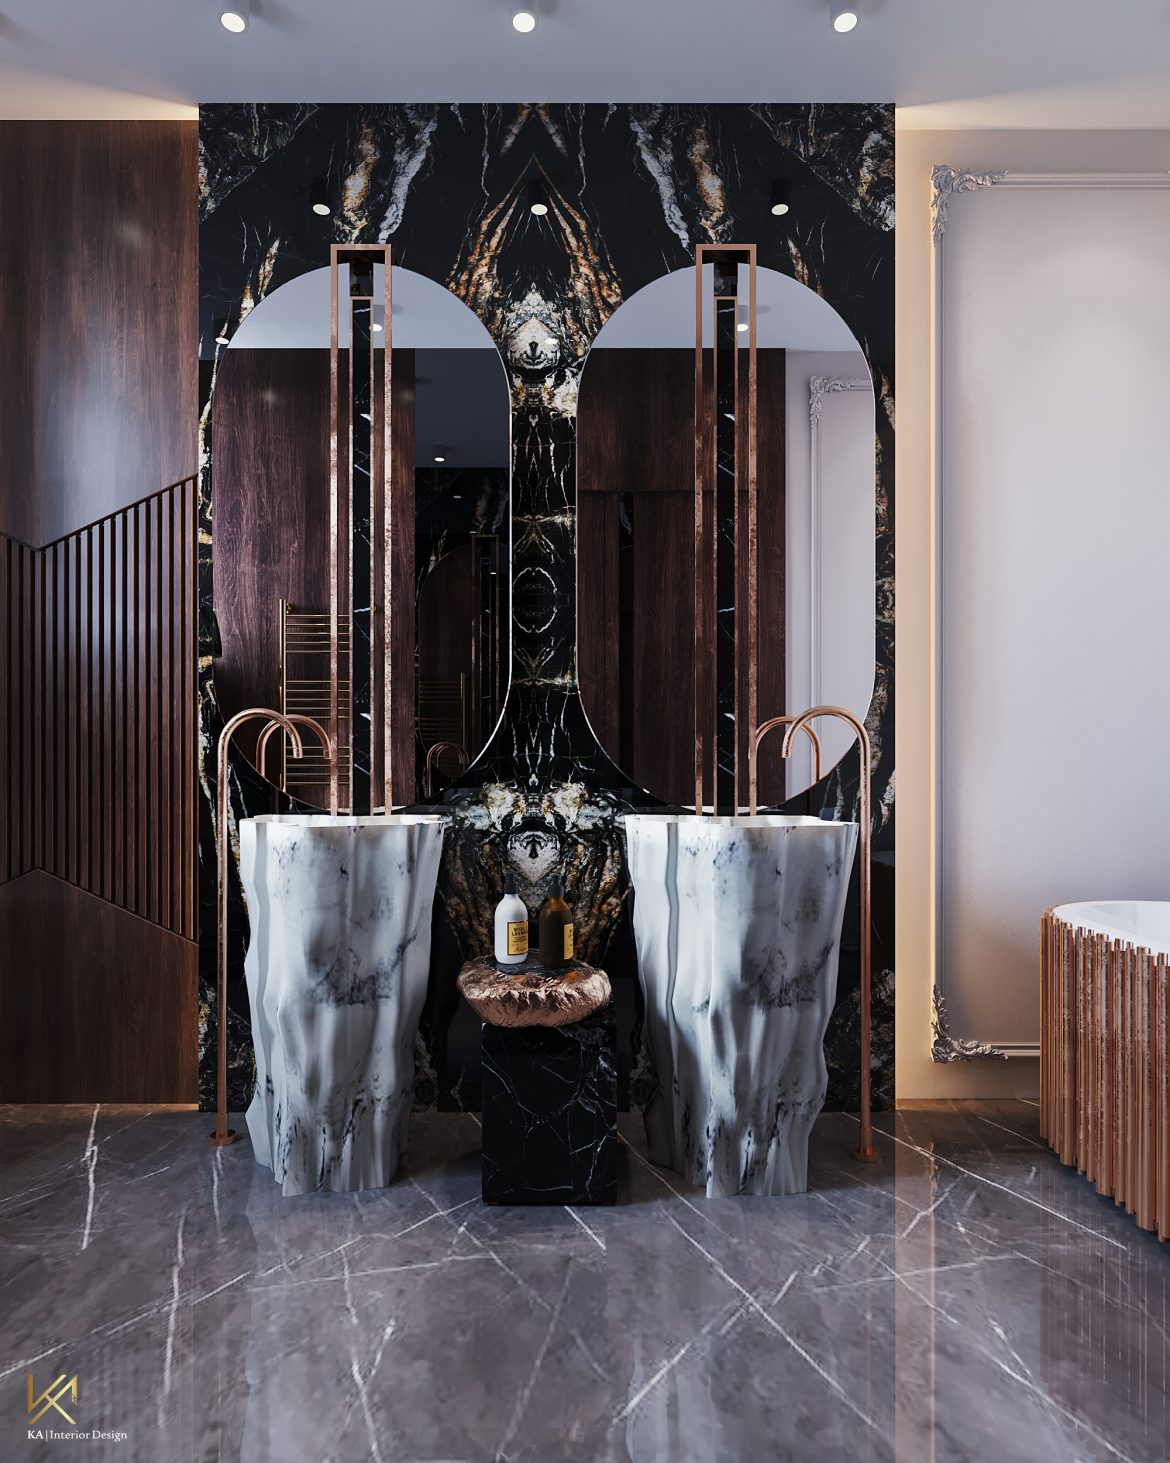 Covet House x K.A Interior Design:  A Opulent Modern Classic Villa In Riyadh covet house k a interior design opulent modern classic villa riyadh 4